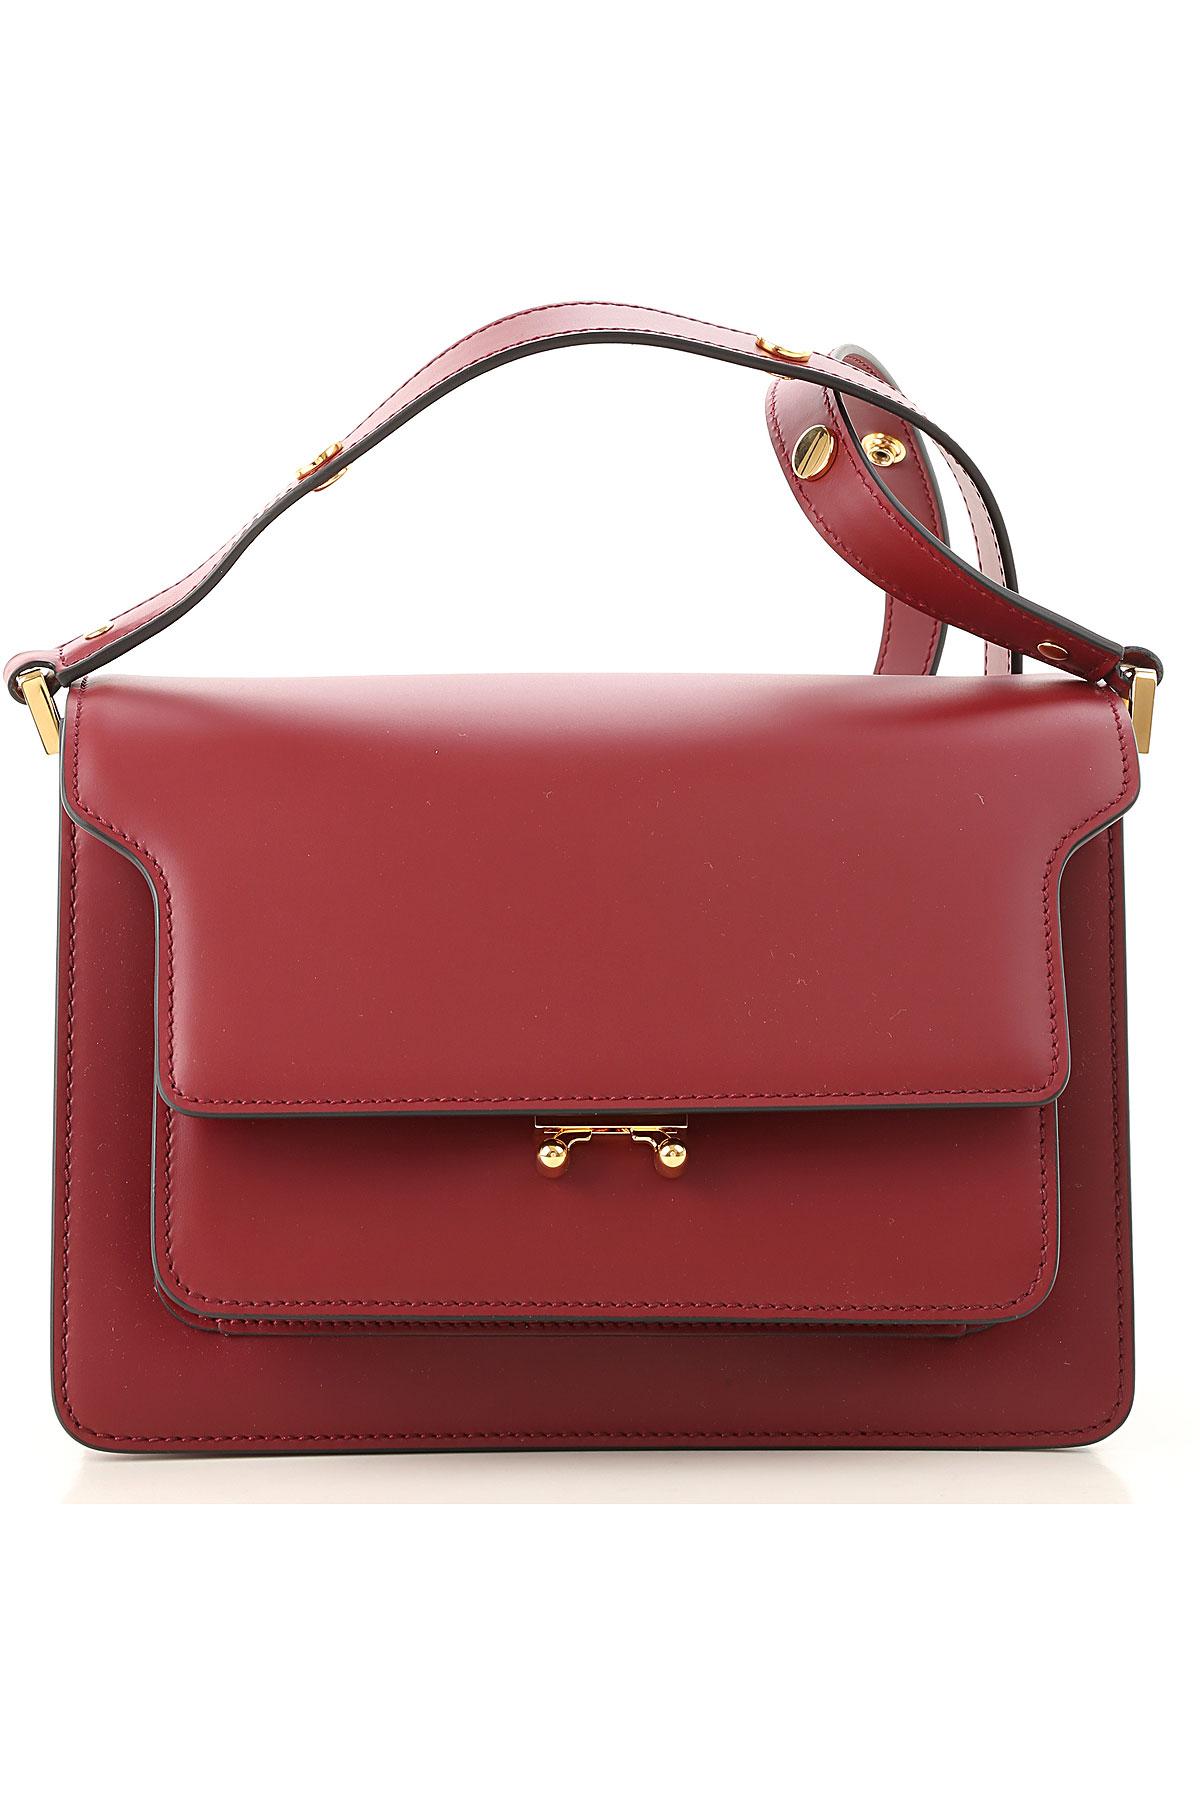 Image of Marni Shoulder Bag for Women, Red, Leather, 2017